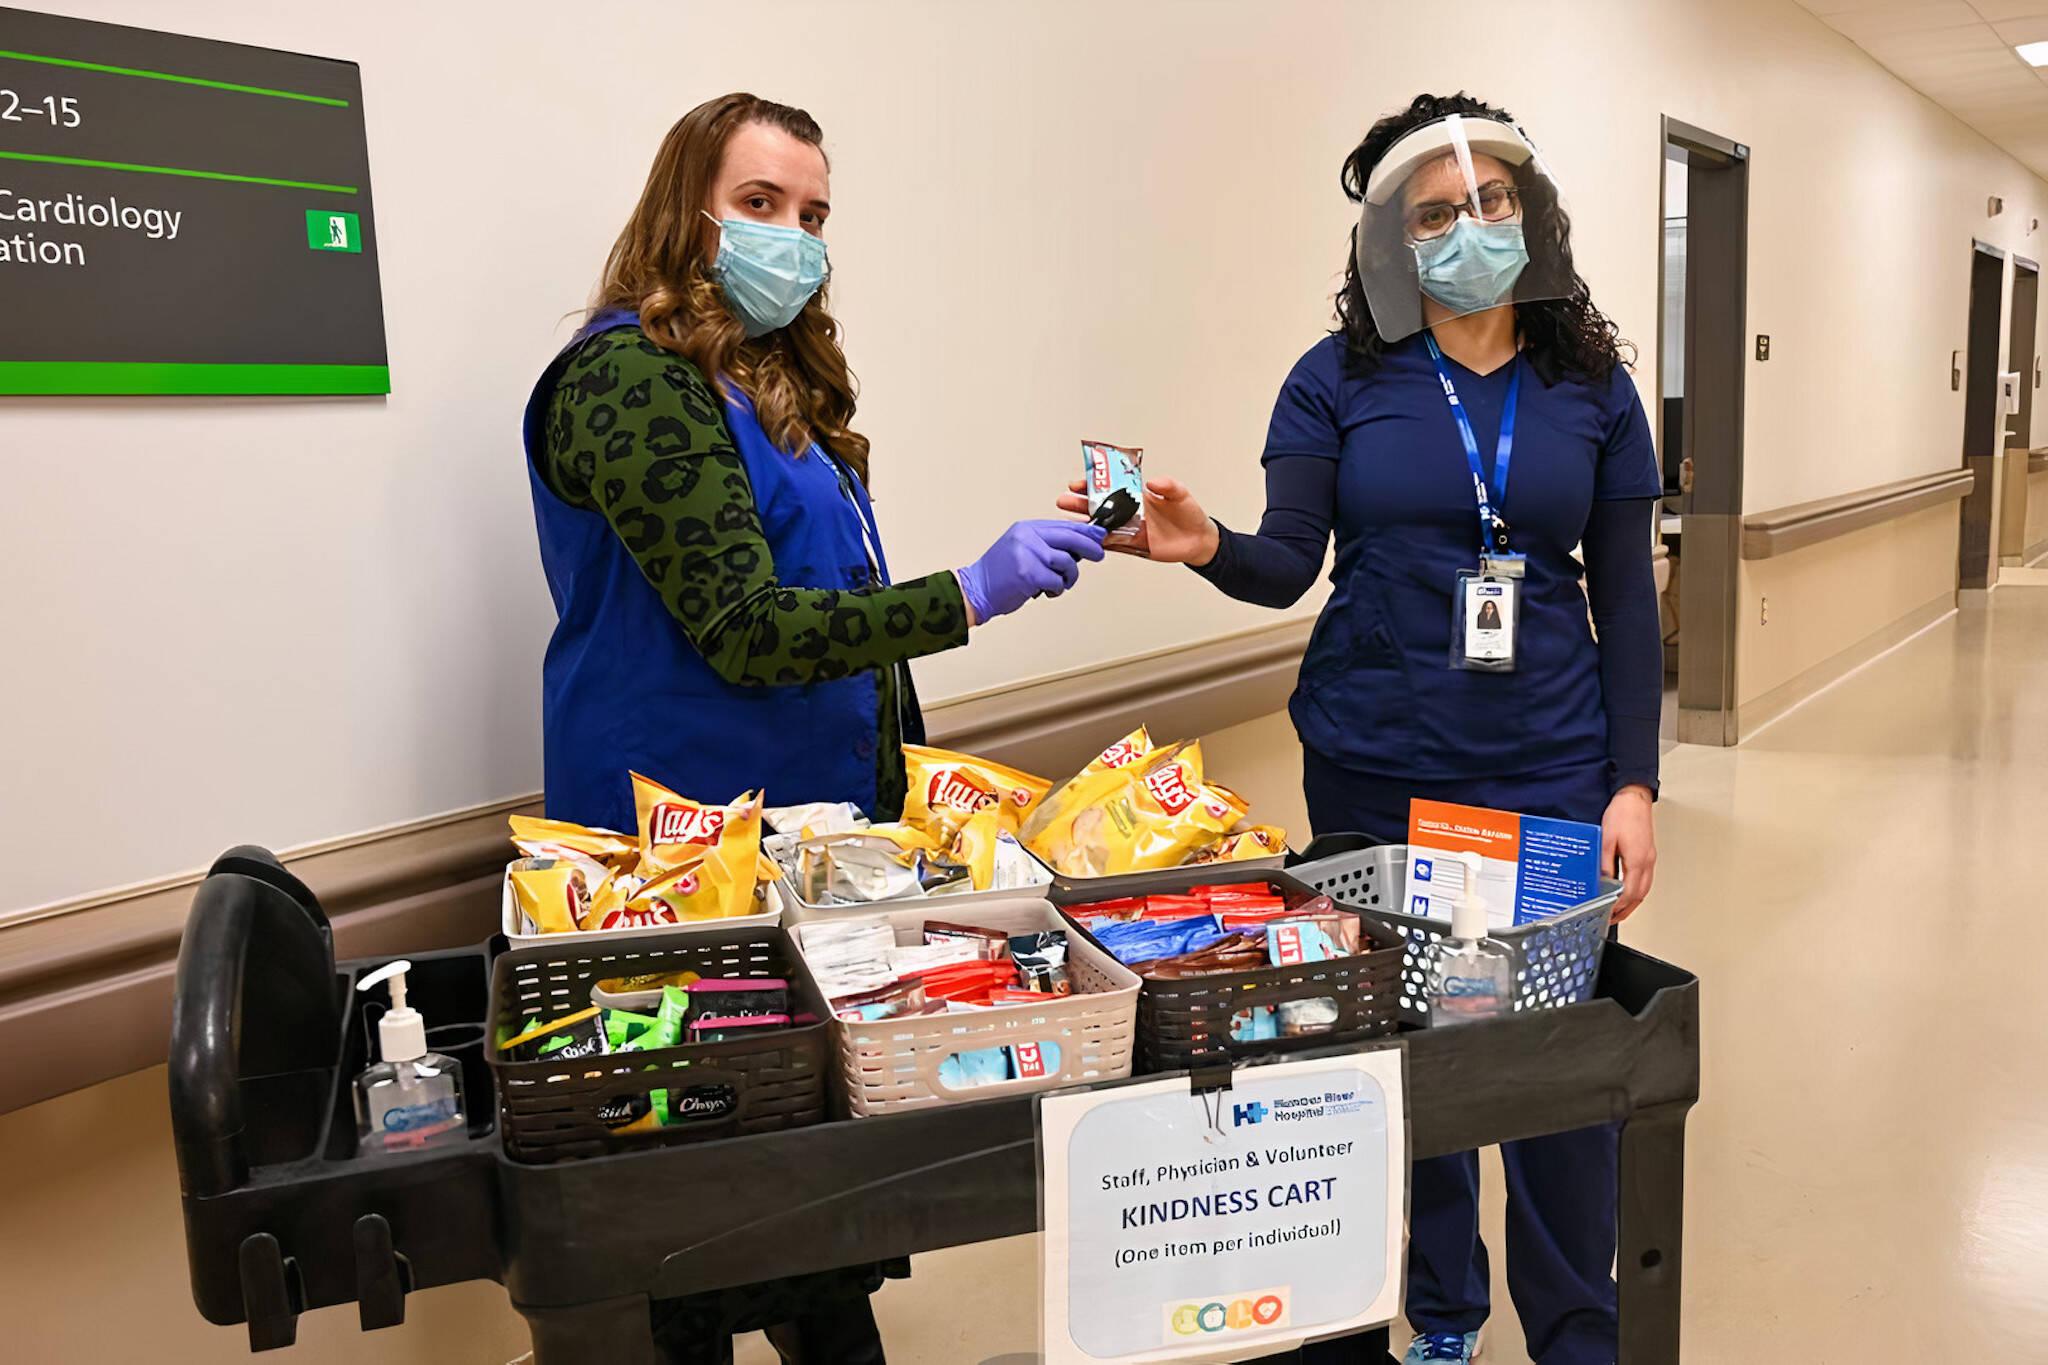 humber river hospital kindness cart